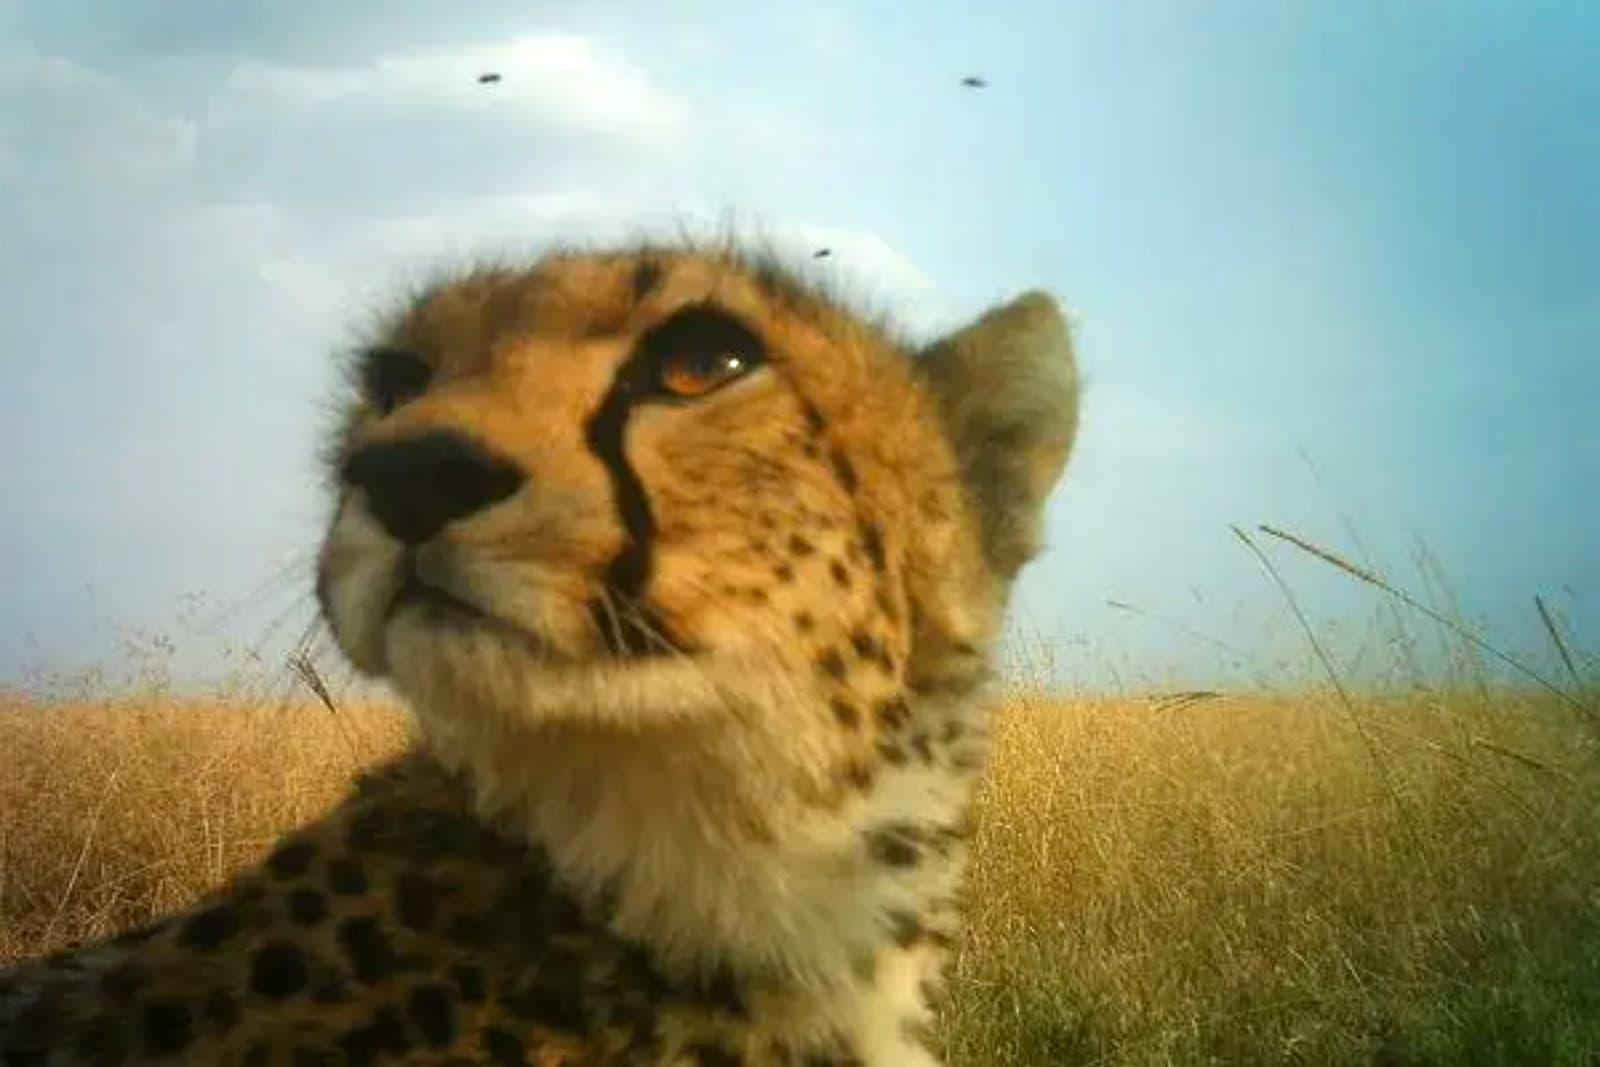 DeepMind uses AI to track Serengeti wildlife with photos